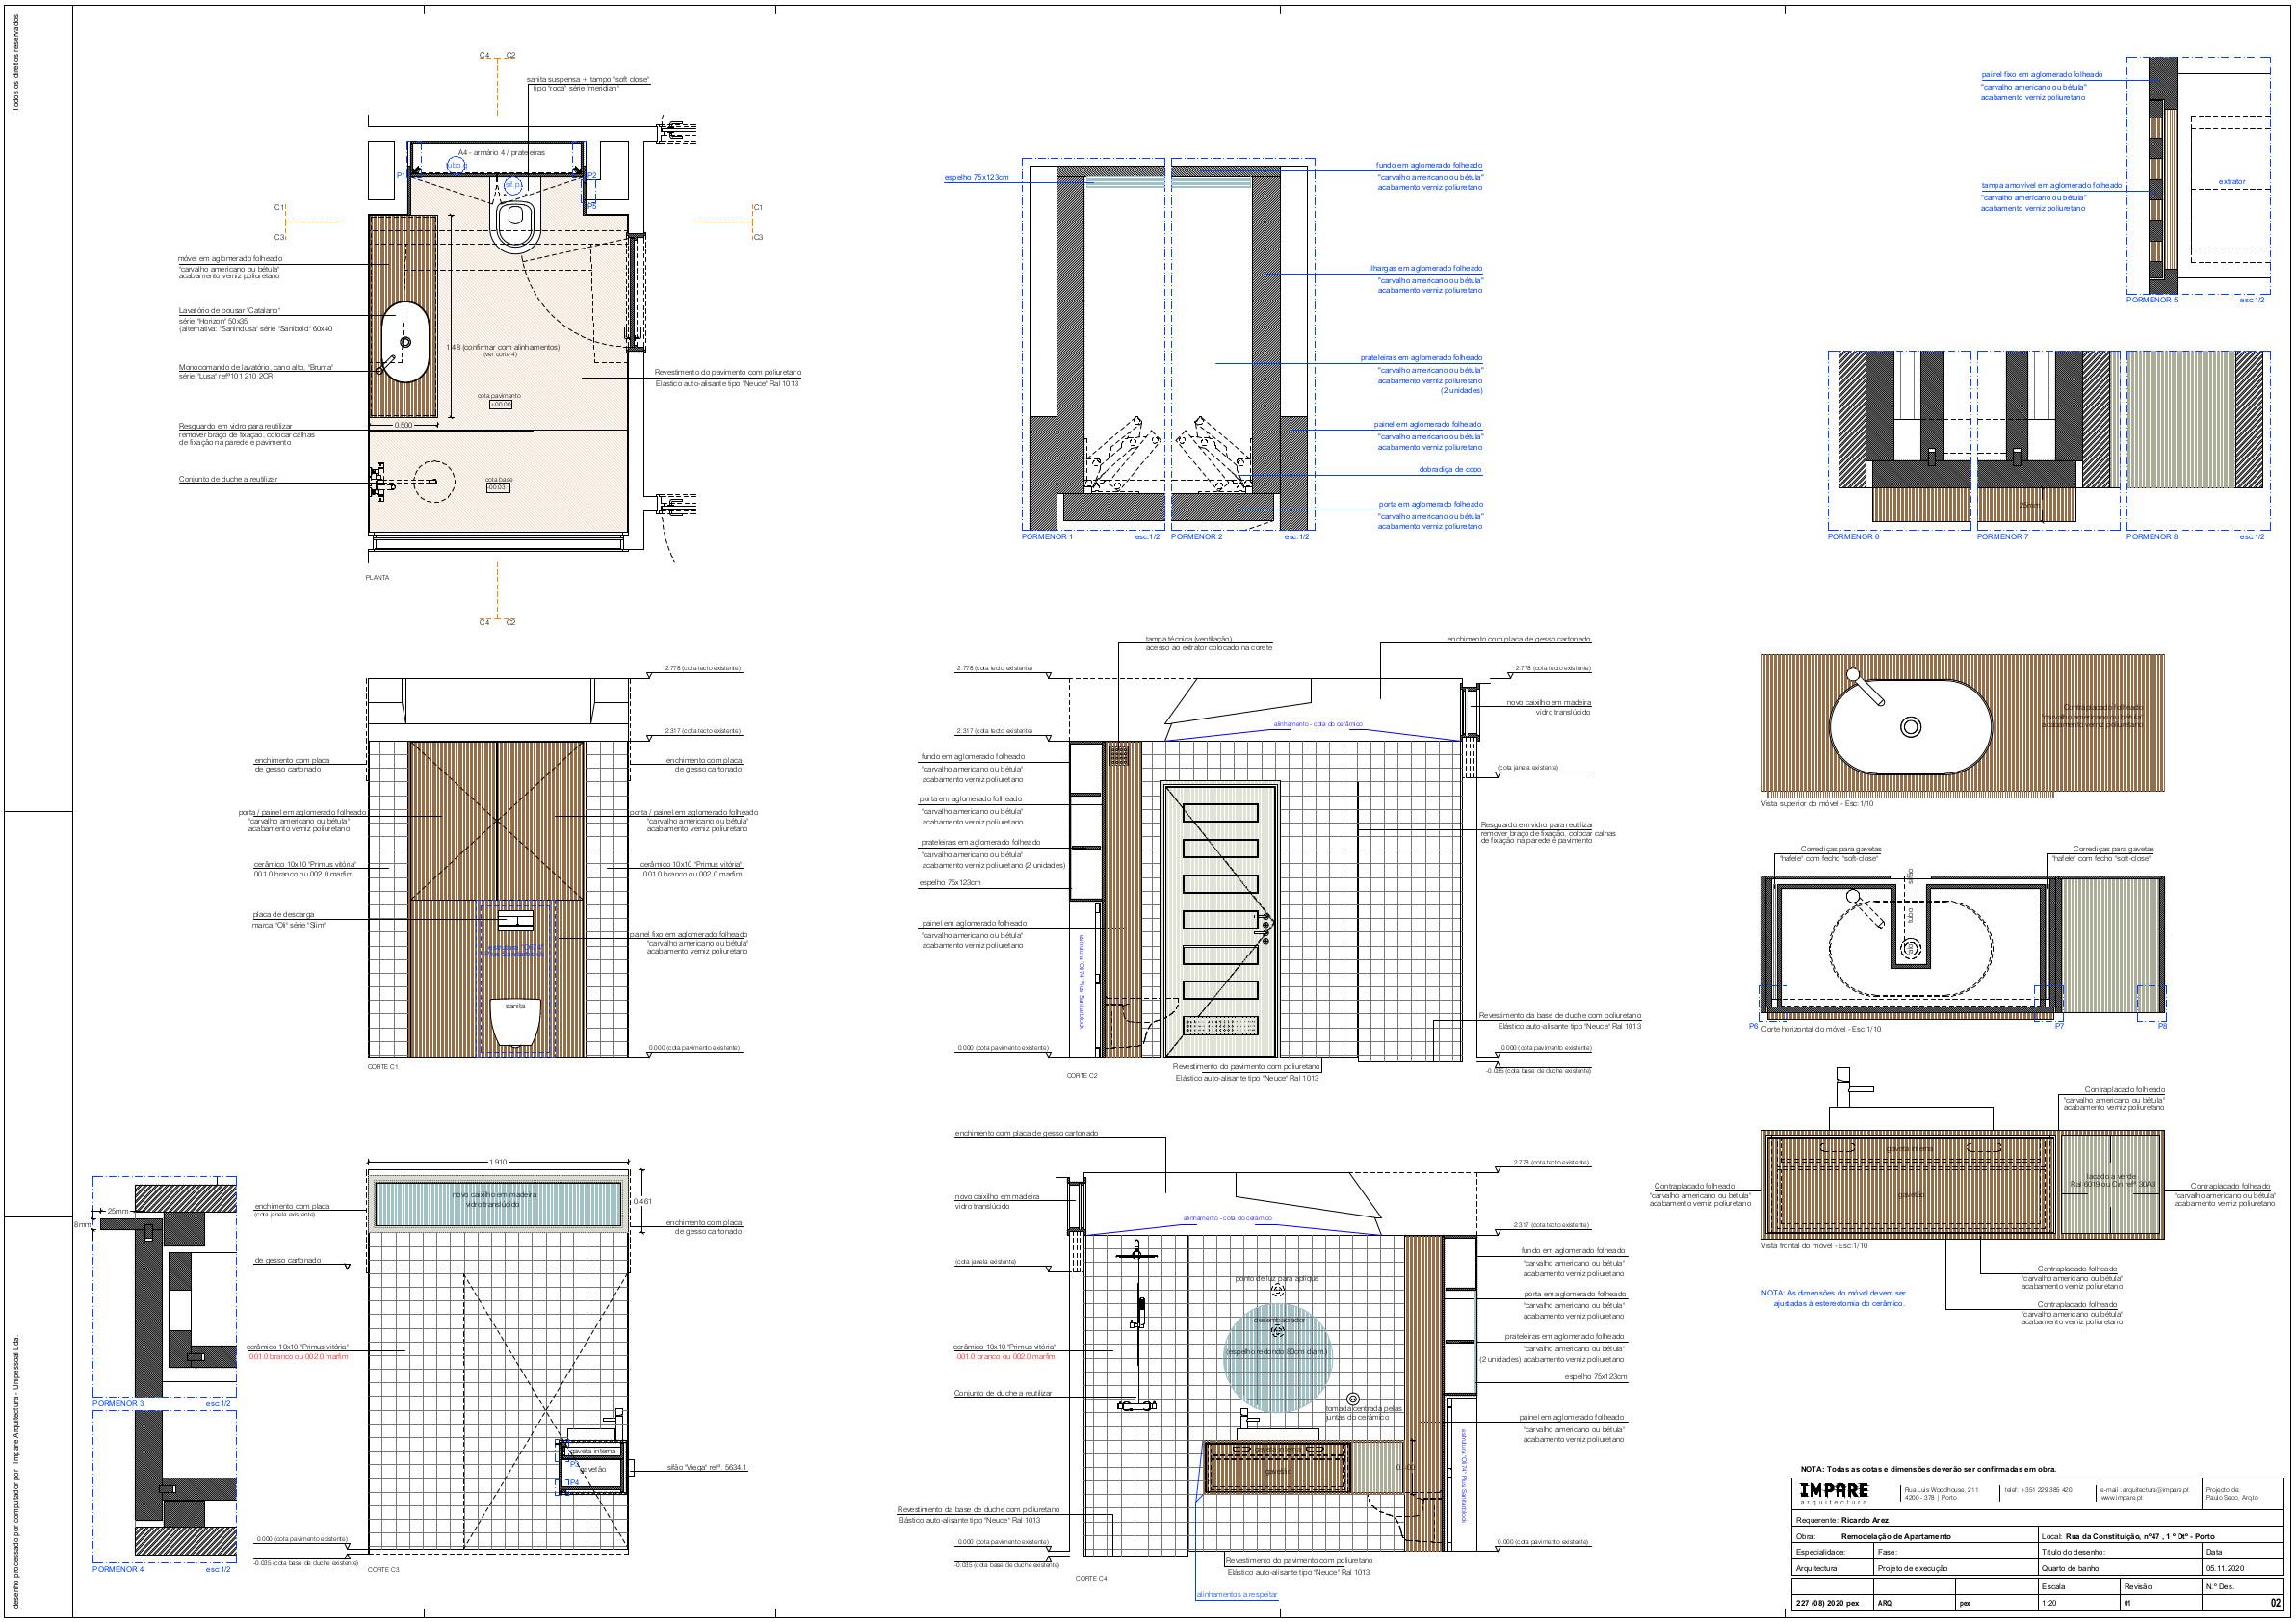 Impare_Arquitectura F02 - Quarto de banho - pex20